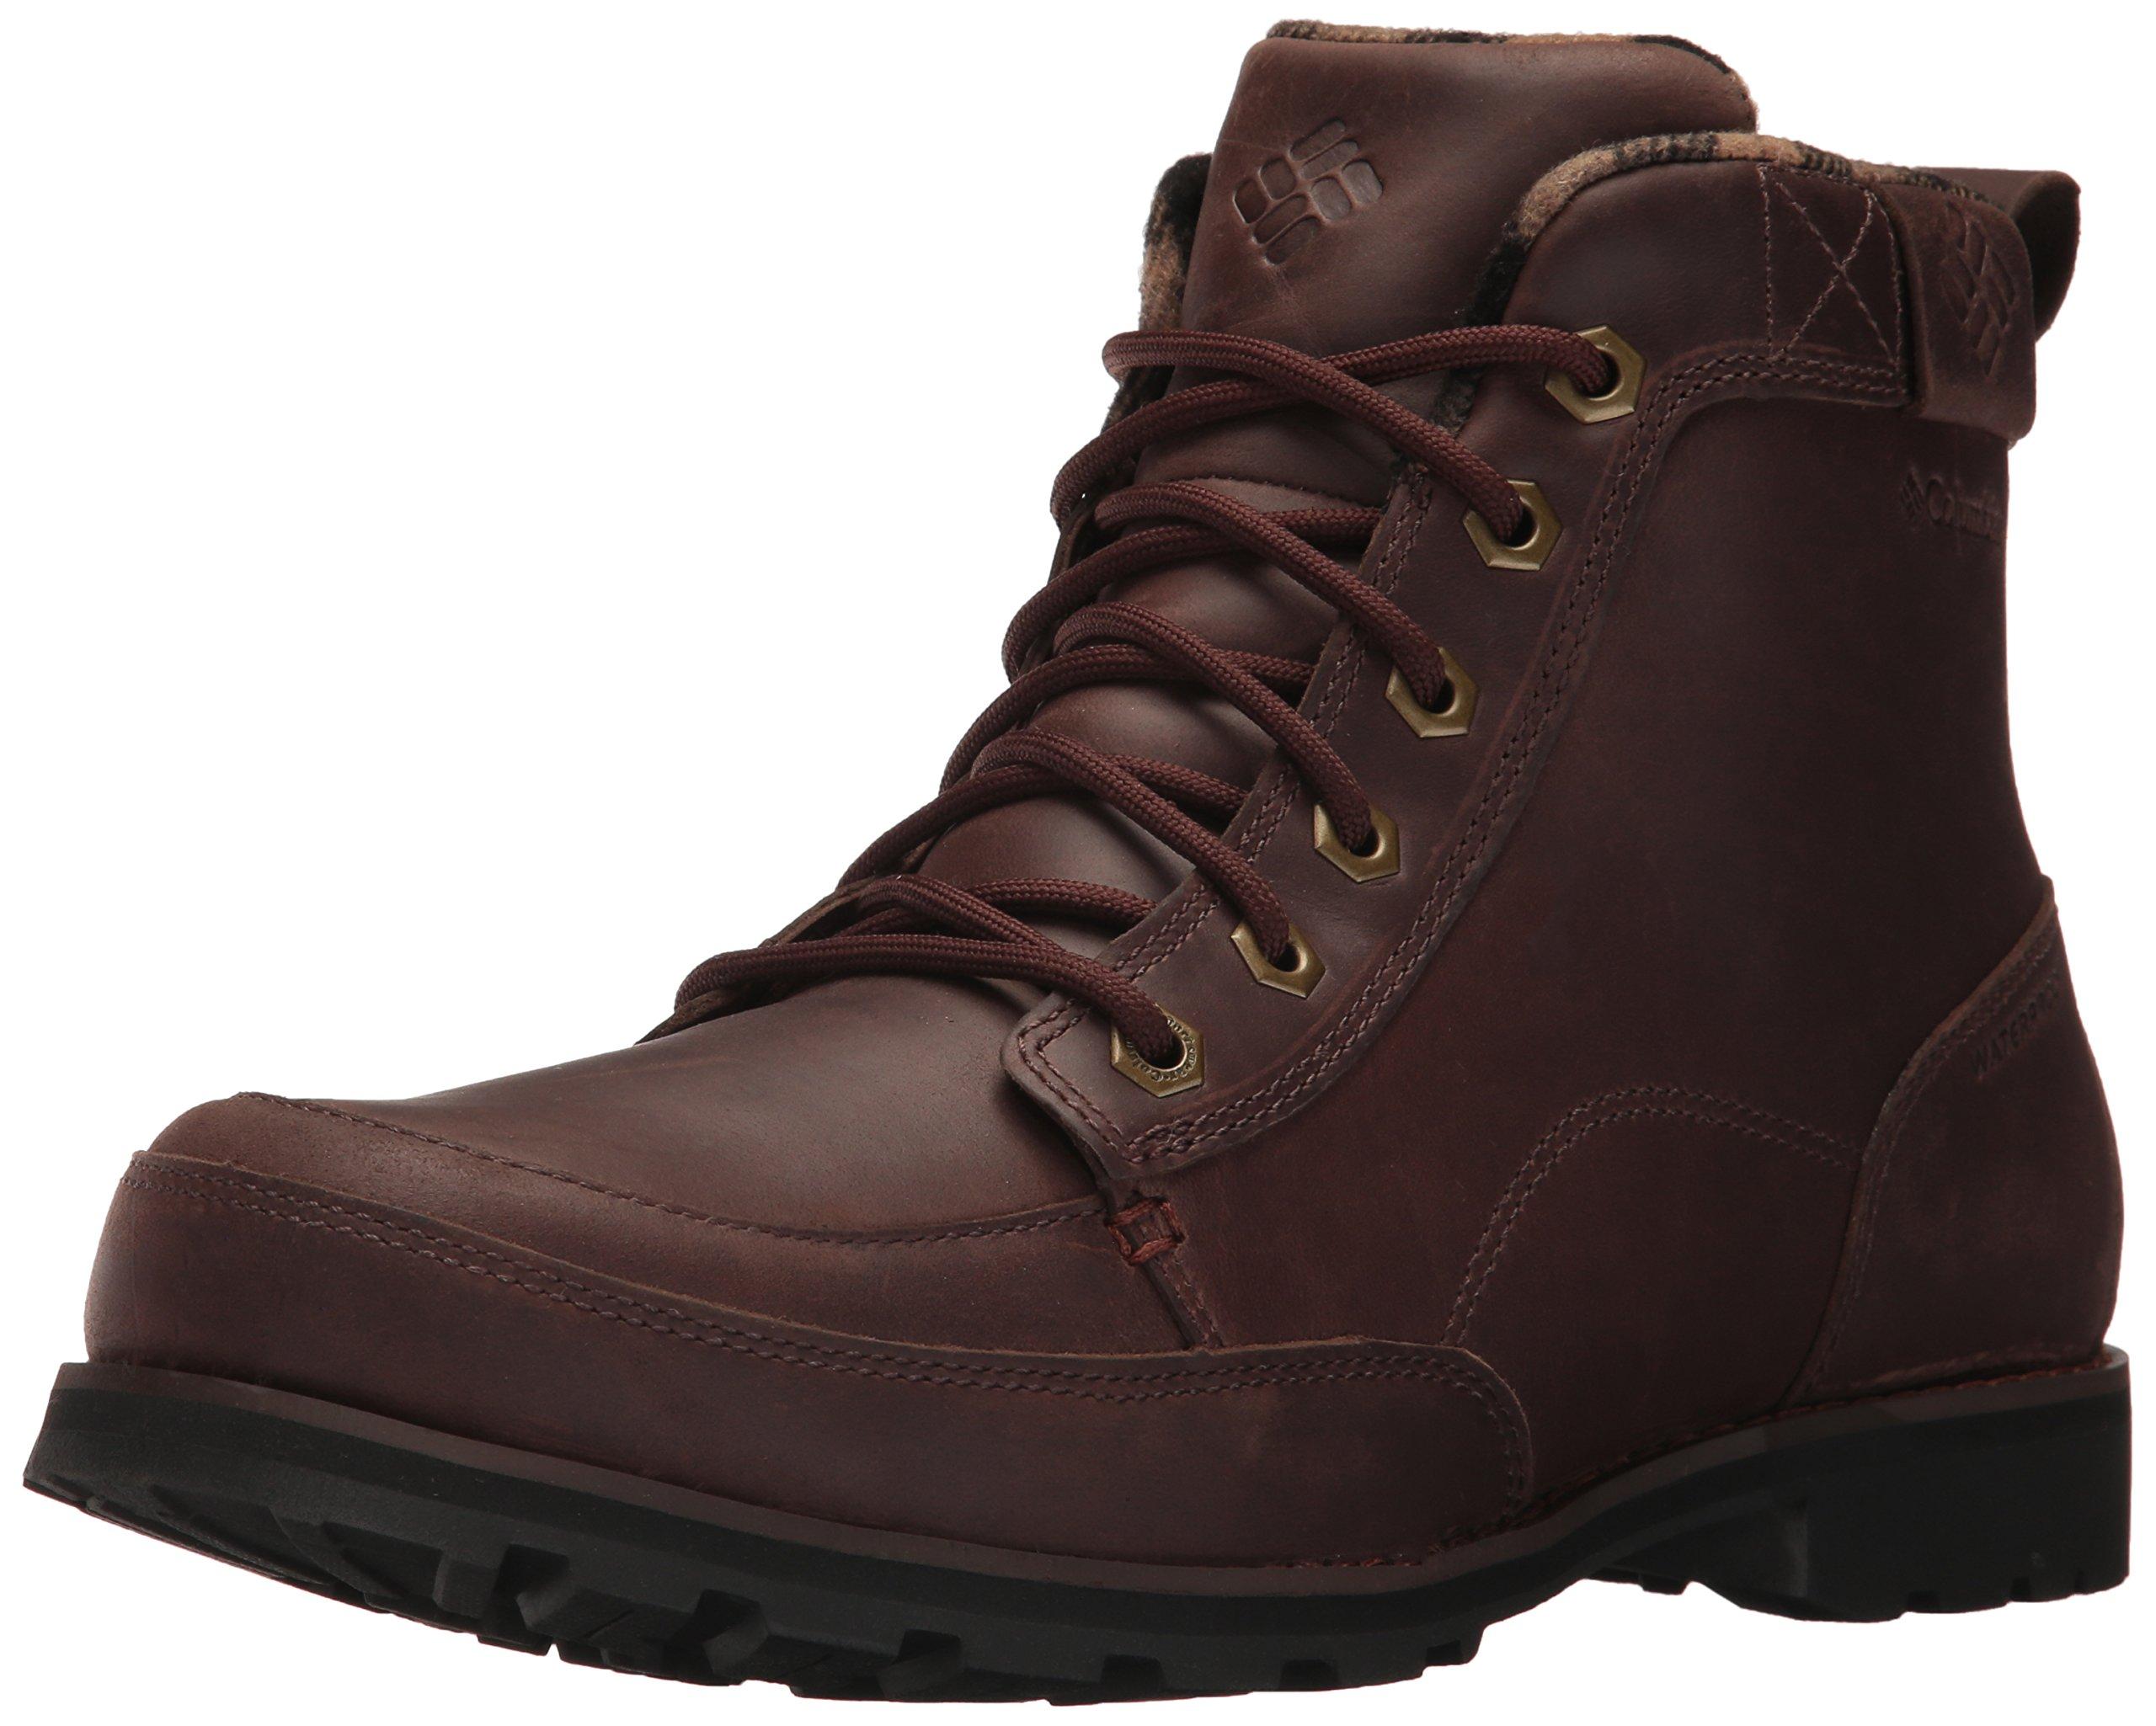 Columbia Men's Chinook Boot Waterproof Uniform Dress Shoe, Tobacco, Cinnamon, 8 D US by Columbia